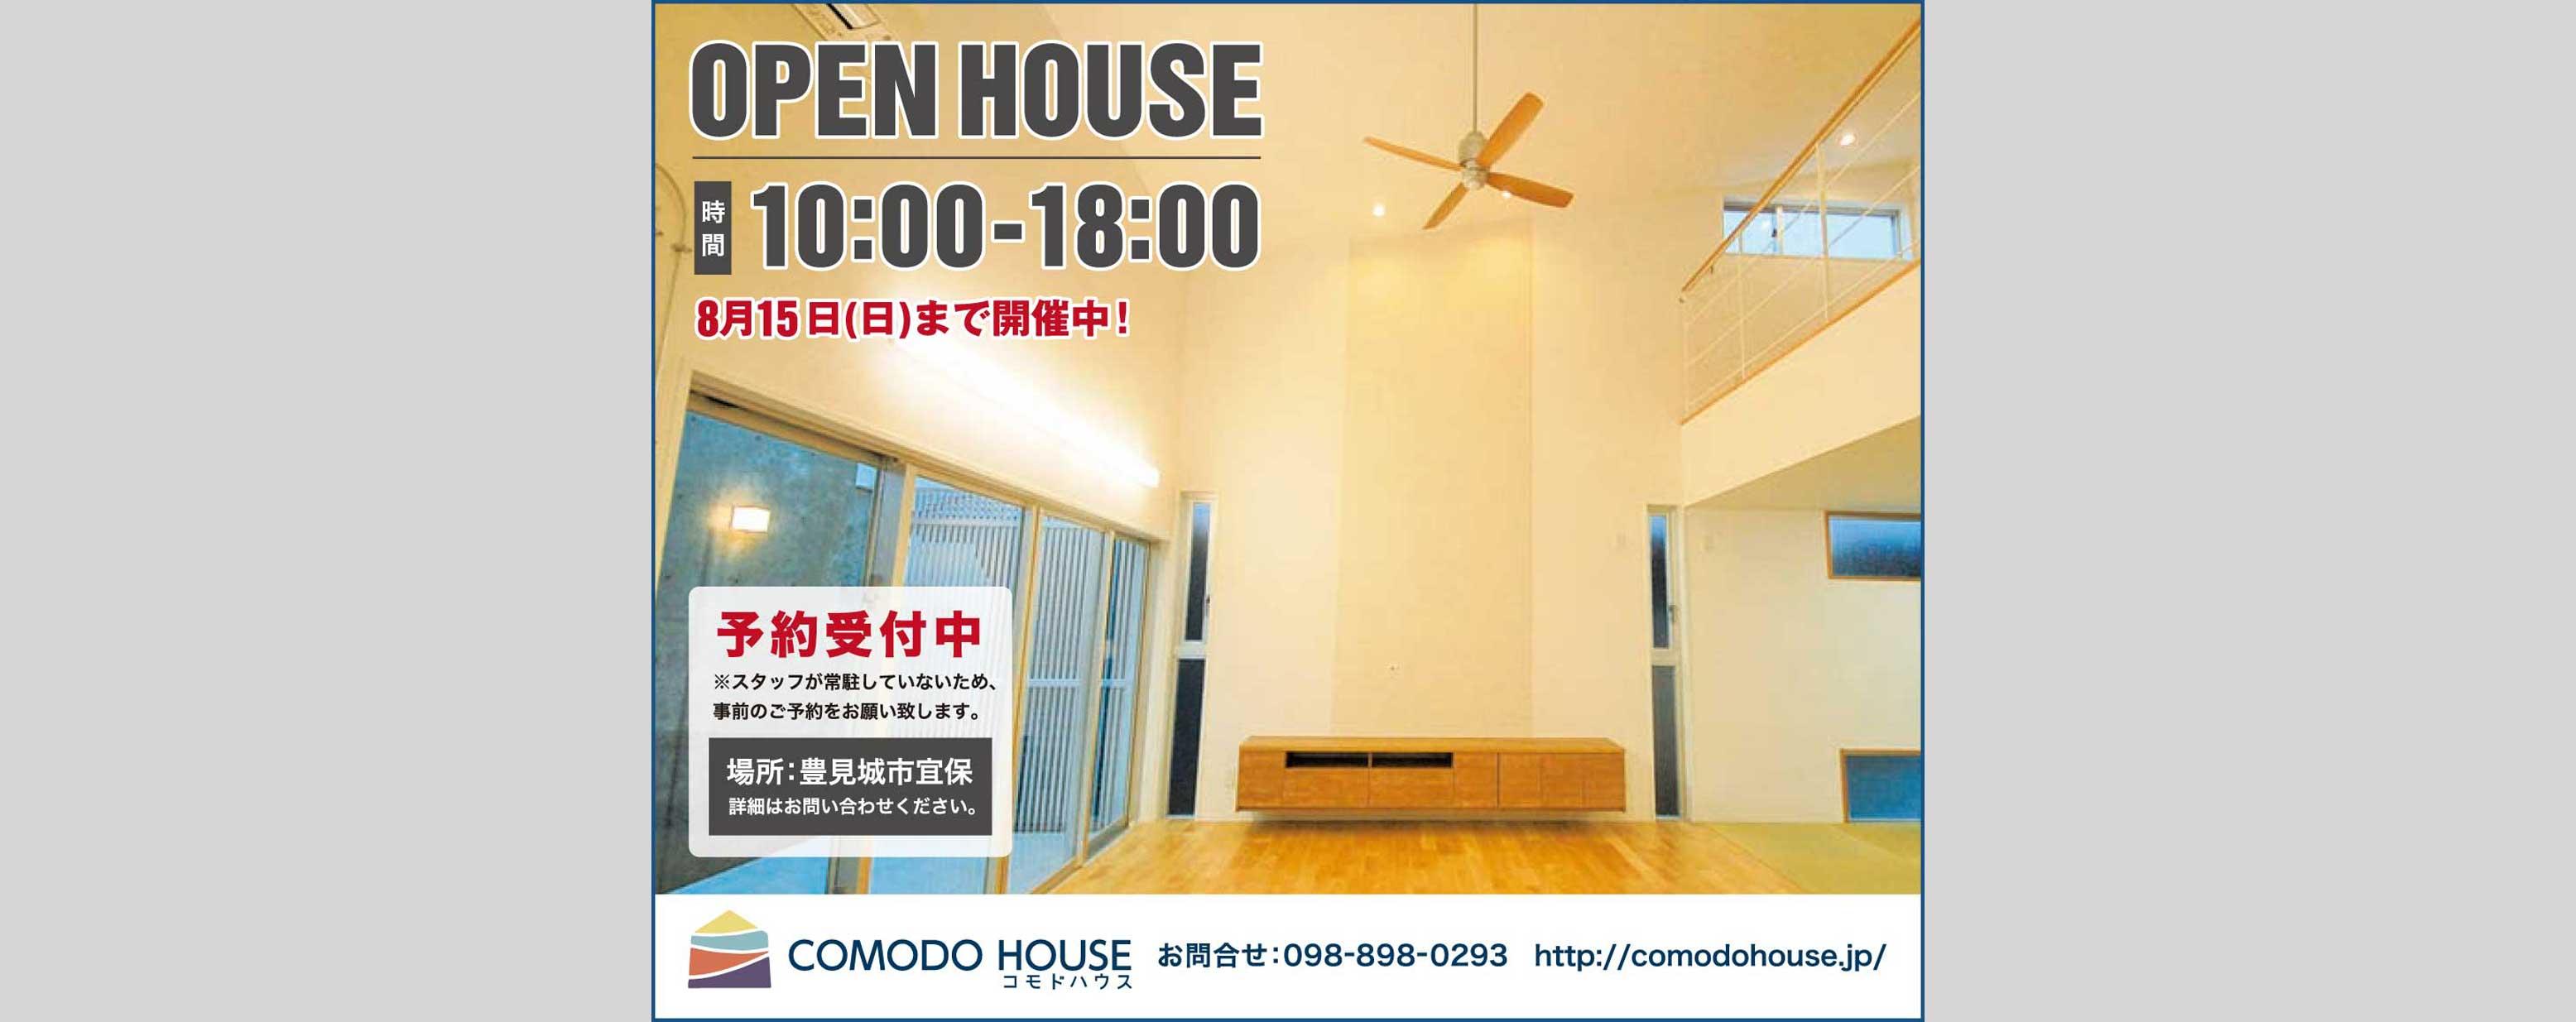 COMODO HOUSEが豊見城市宜保でOPEN HOUSE開催中(8/15まで)